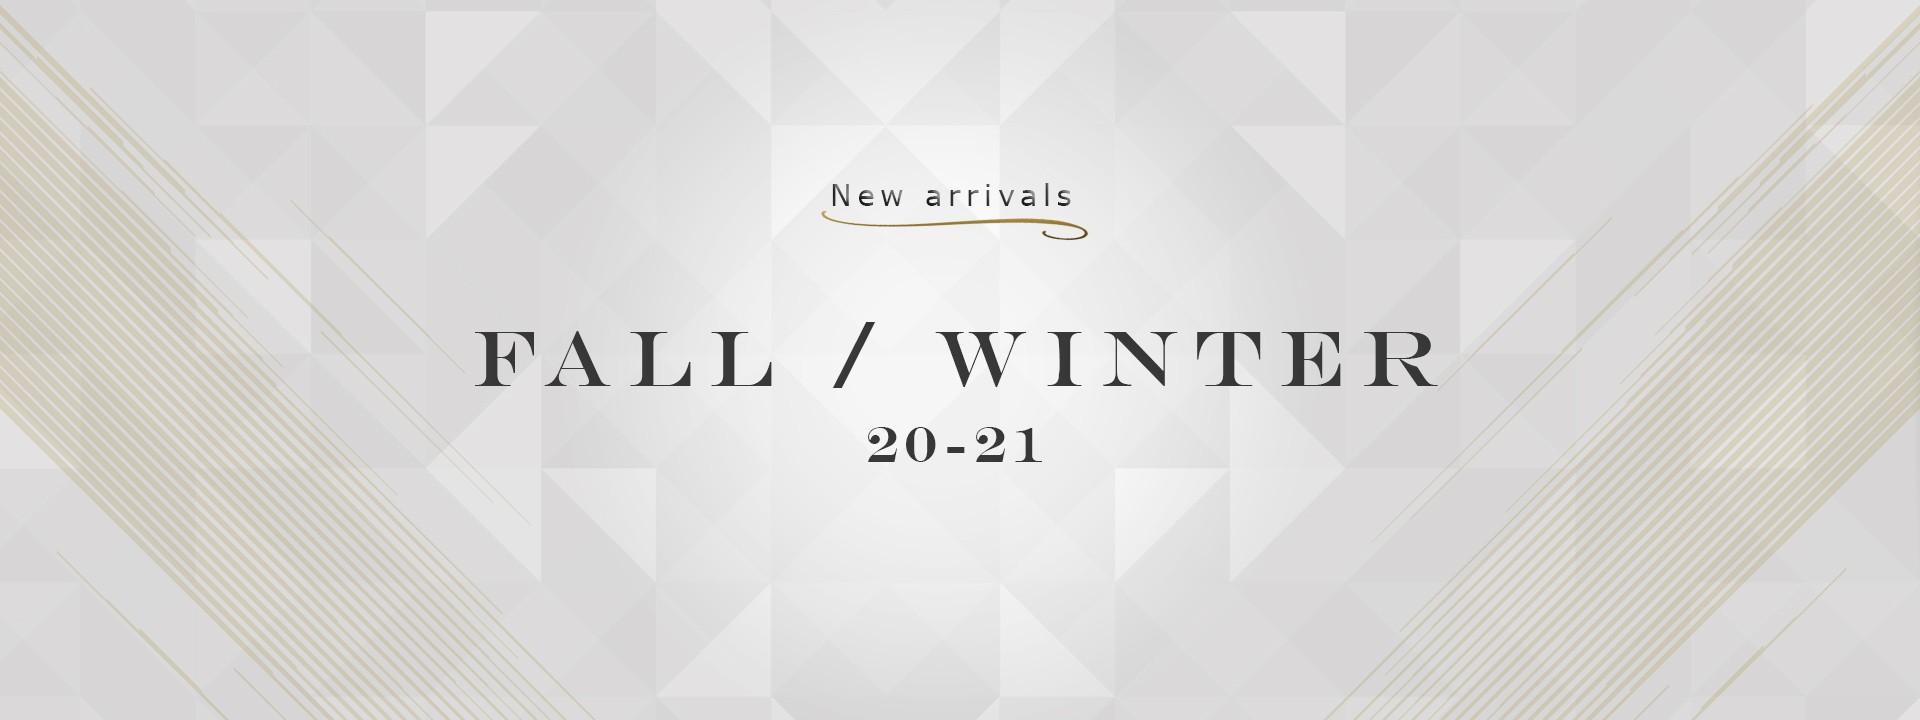 FALL / WINTER 2020-21